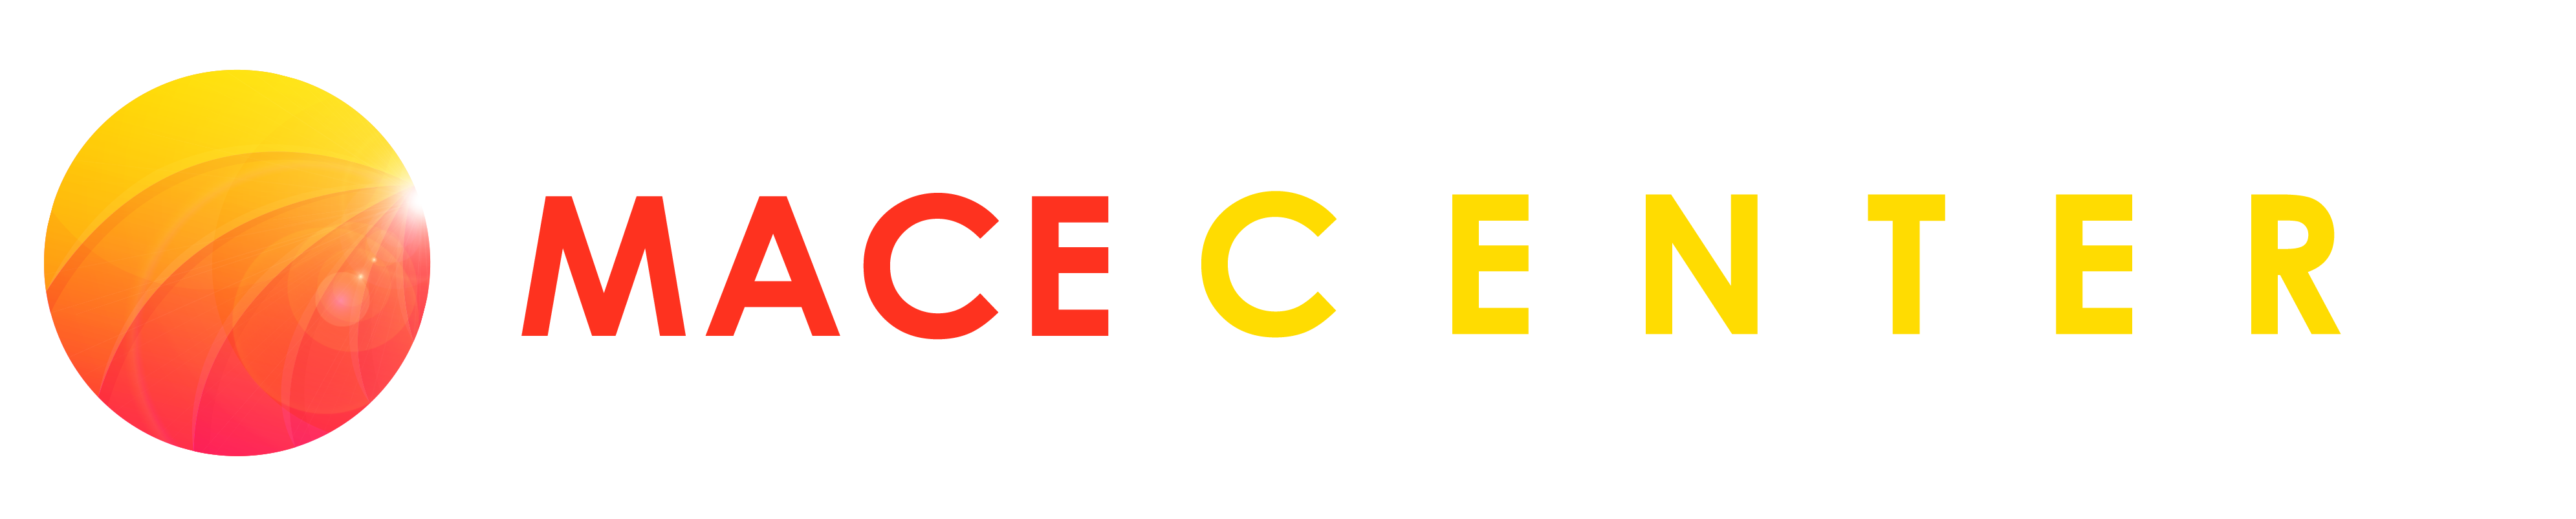 MACE Center